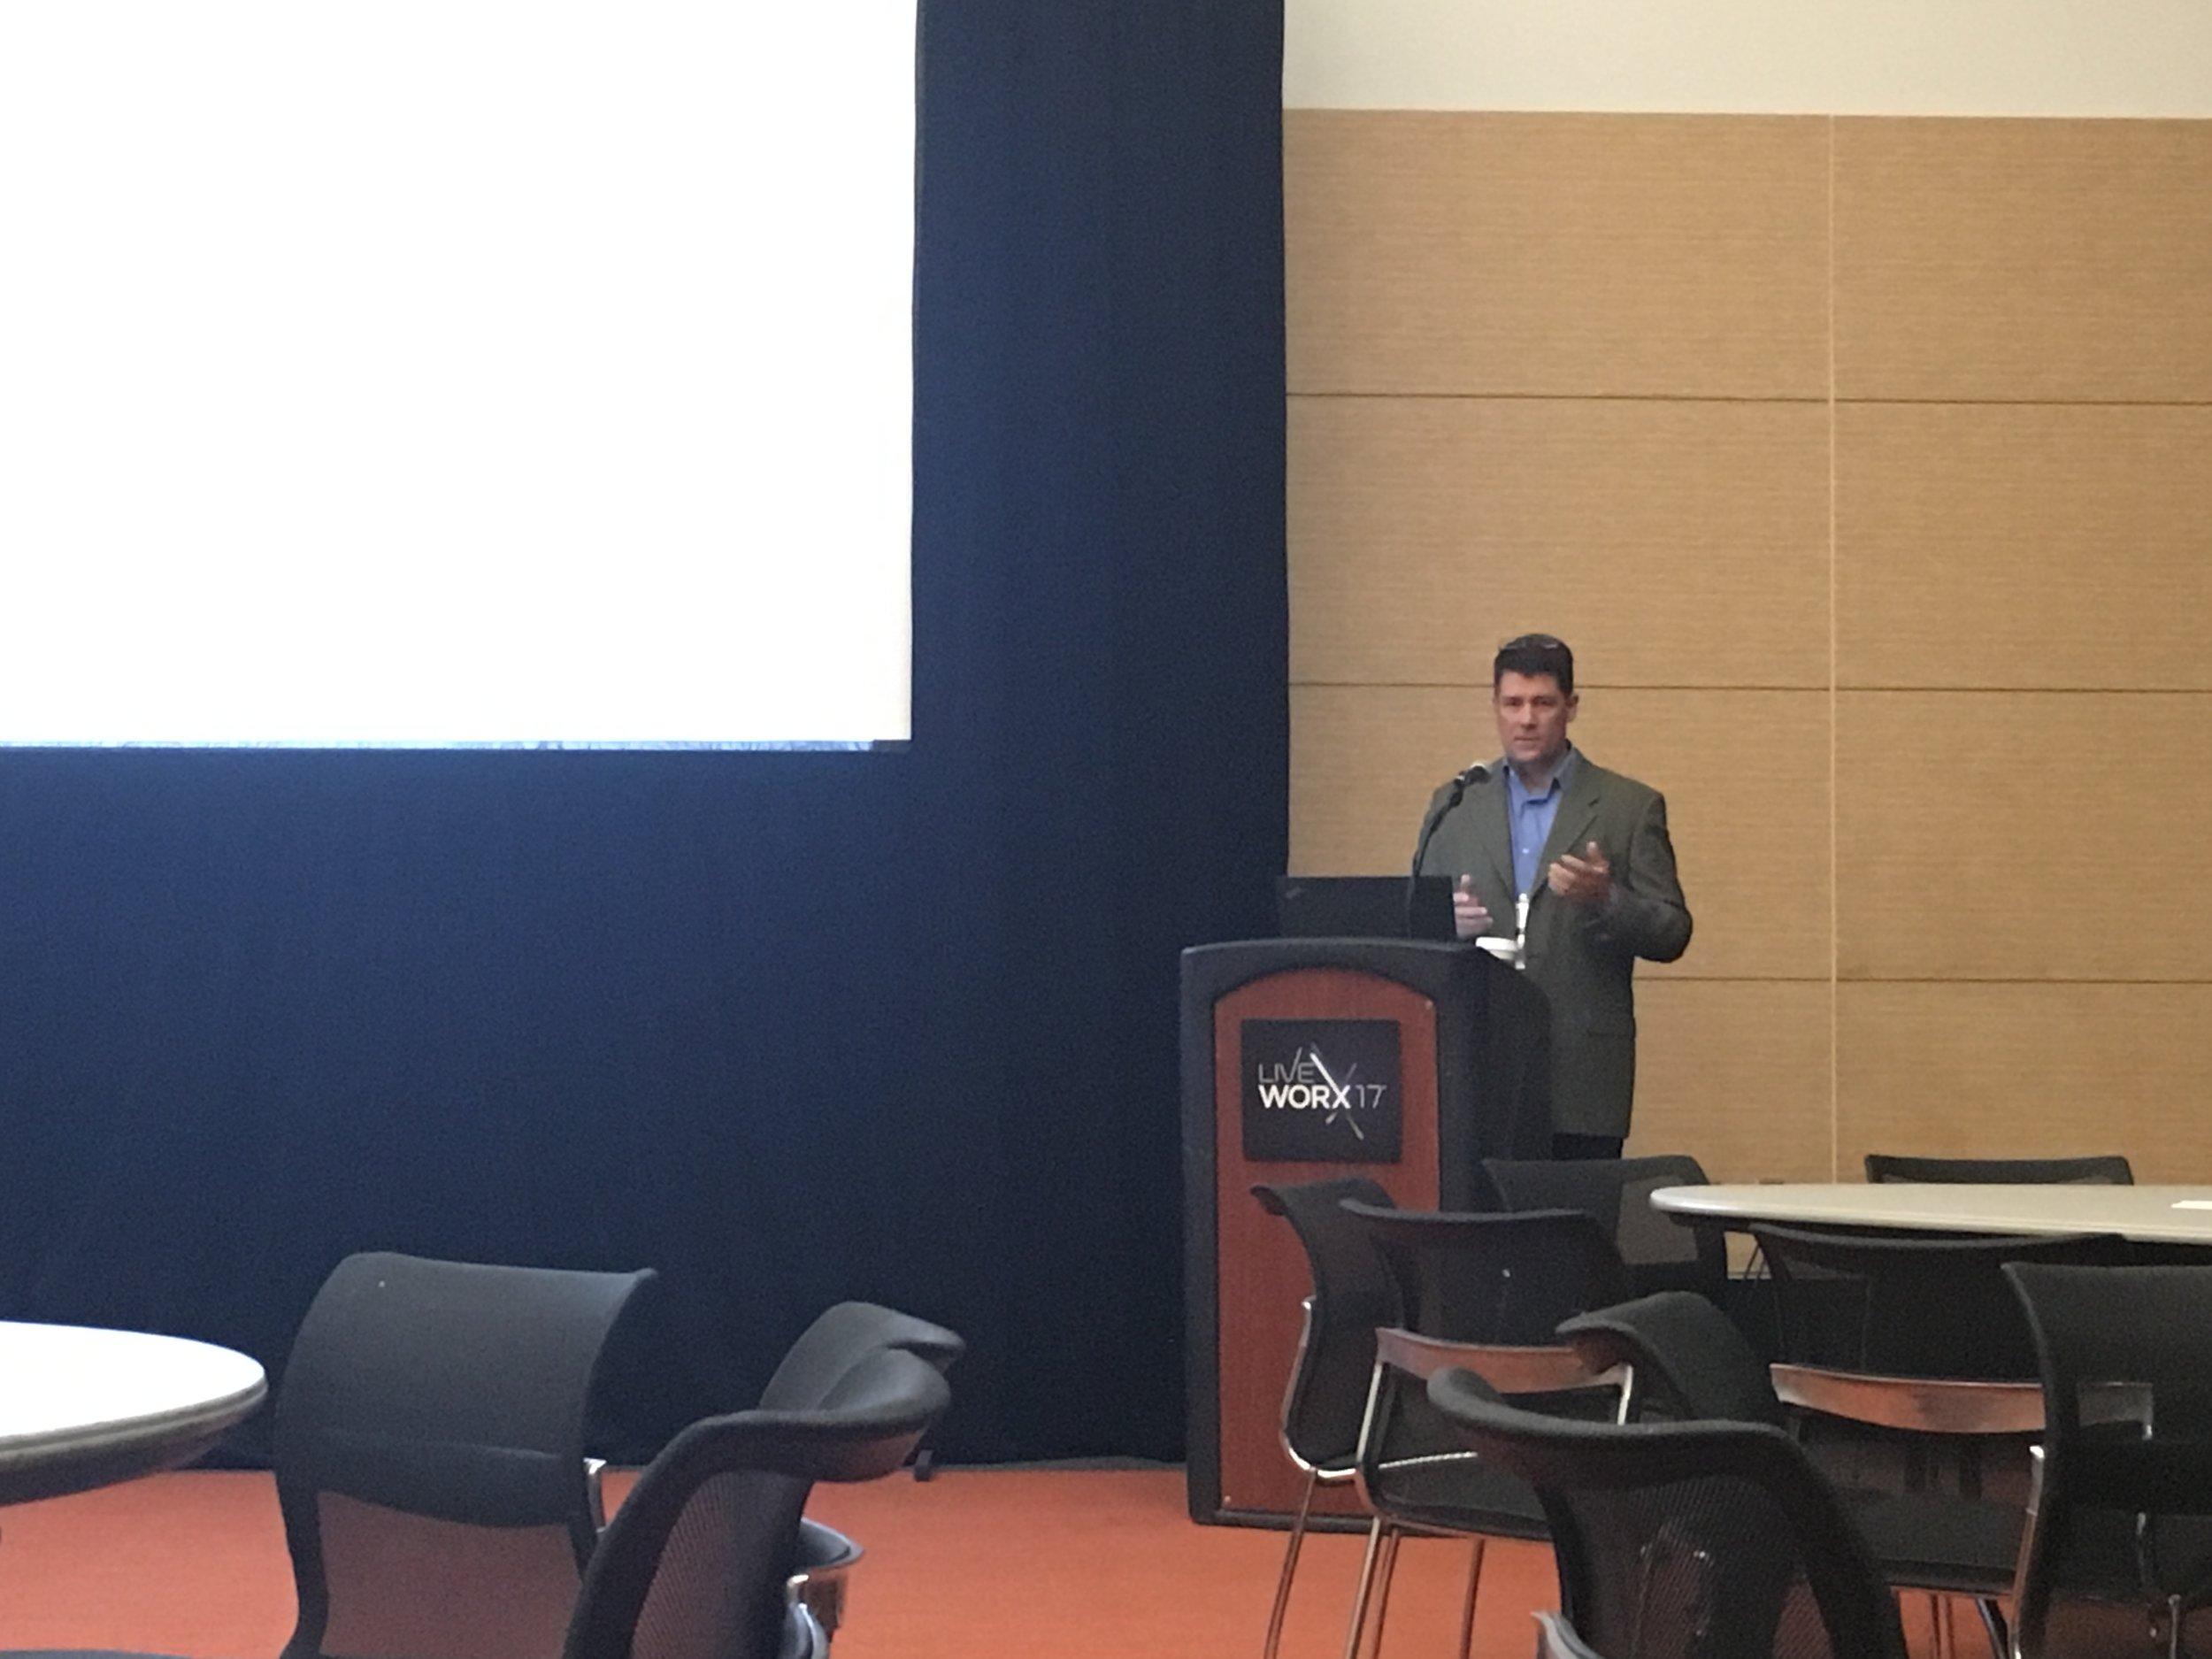 David Kellner presents at LiveWorx